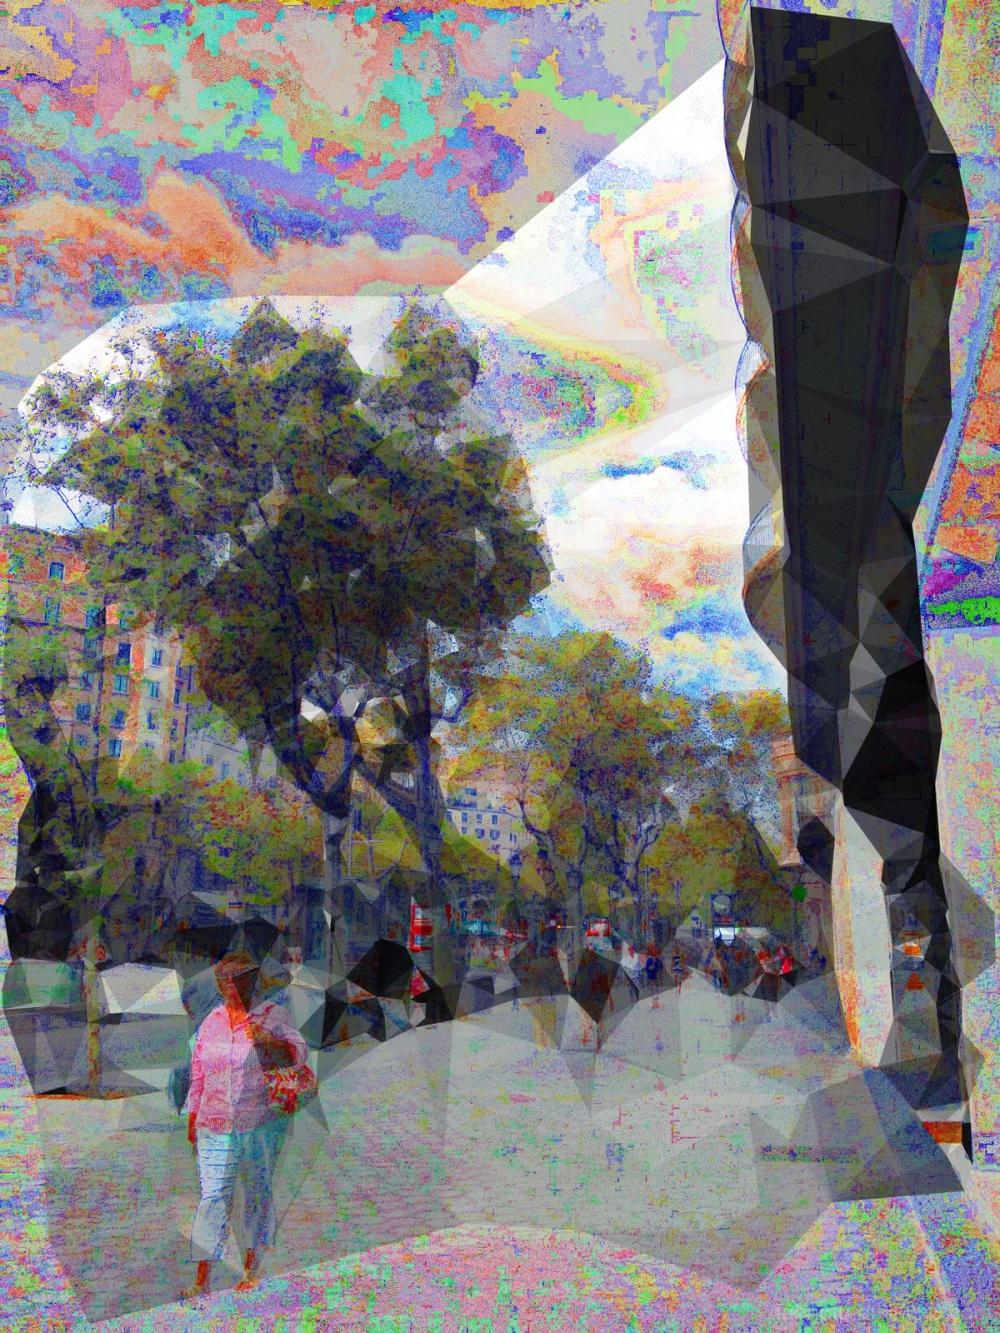 Barcelona street photography photomanipulation.